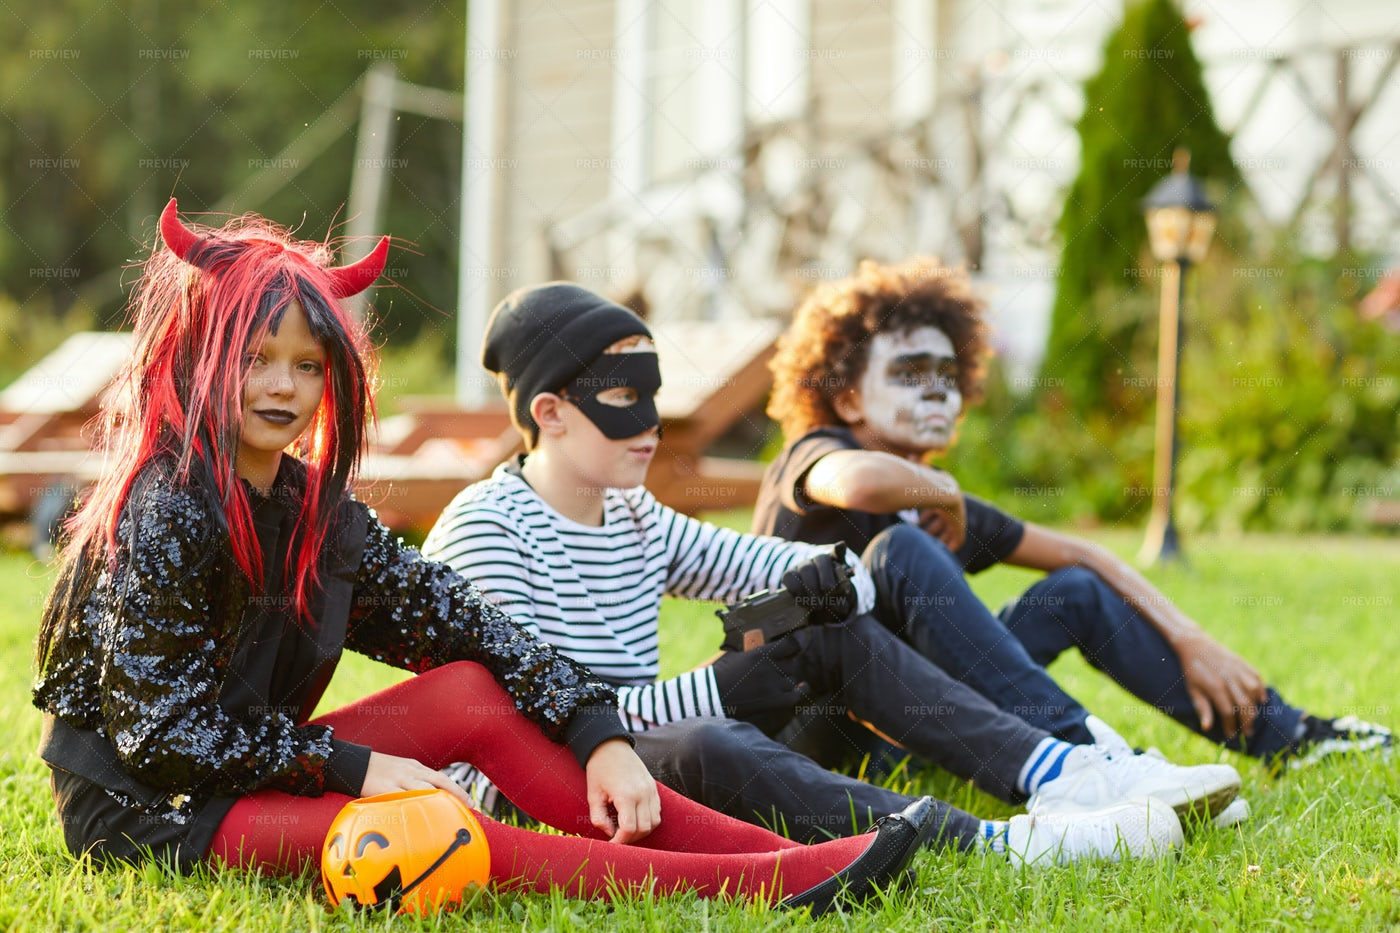 Kids Outdoors On Halloween Day: Stock Photos